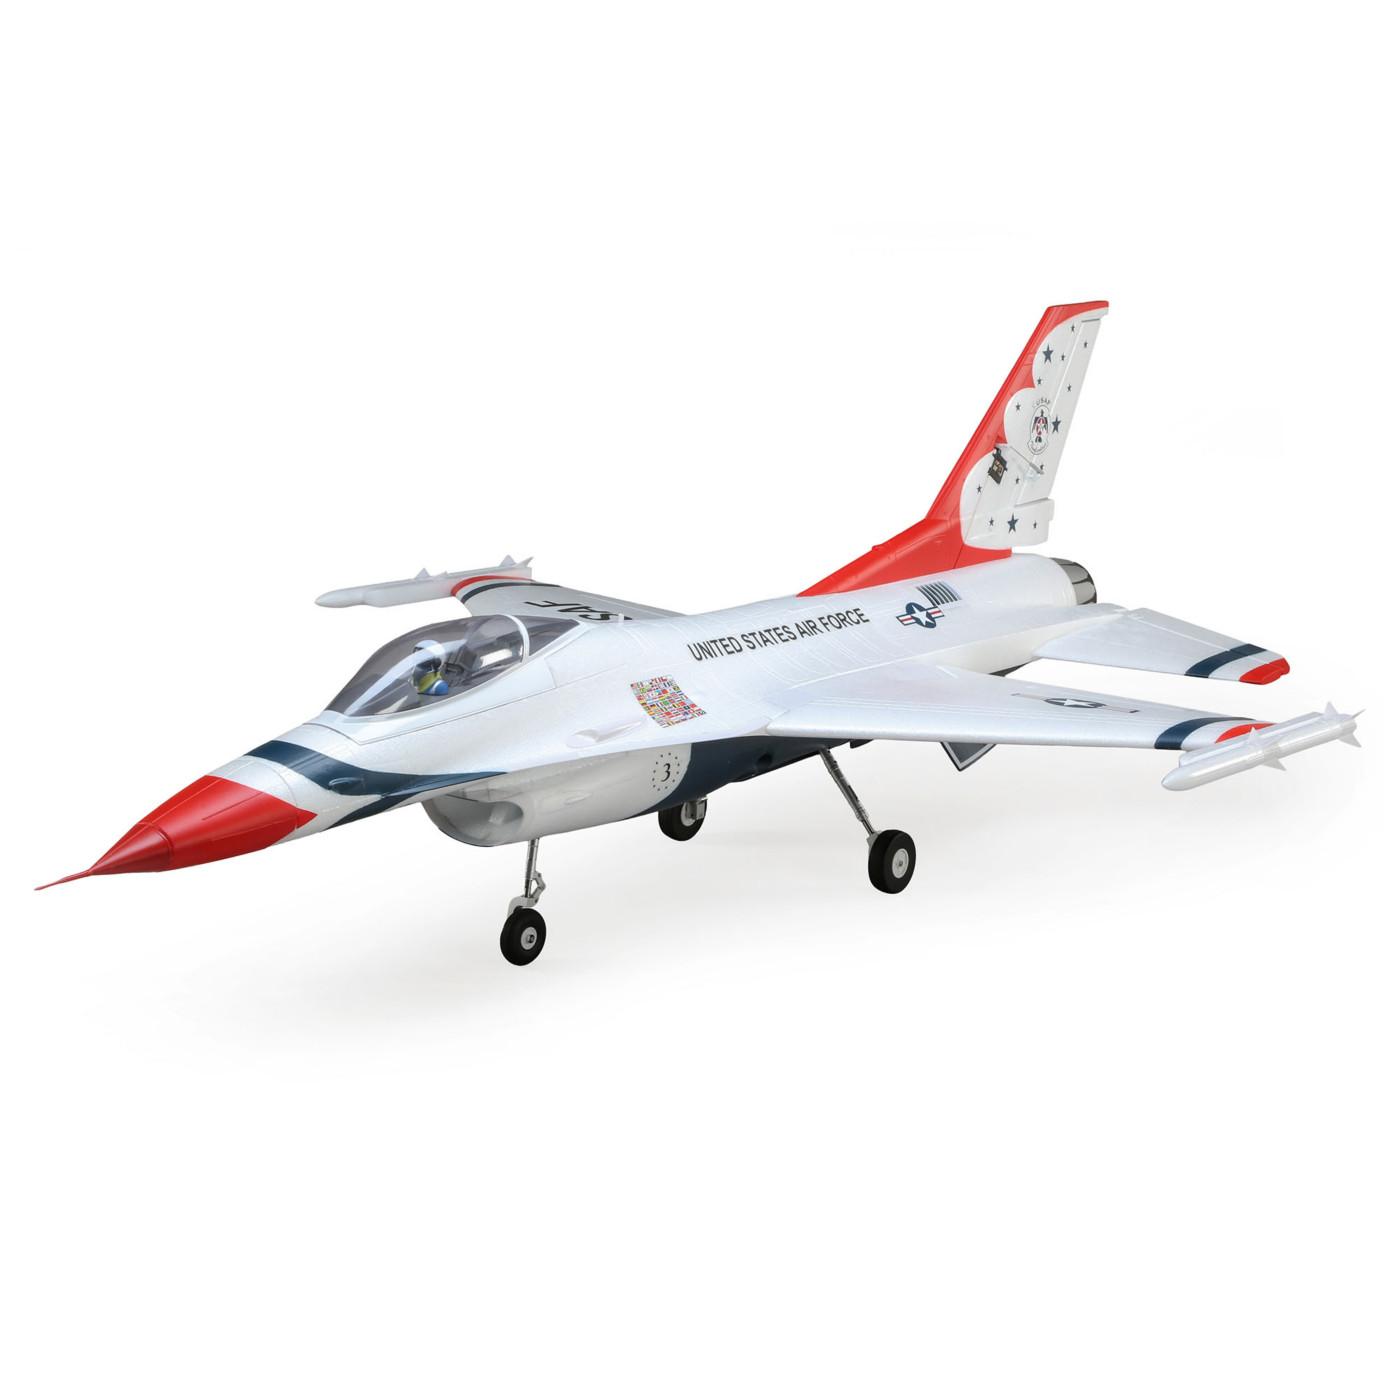 E-flite F-16 Thunderbirds 70mm EDF PNP